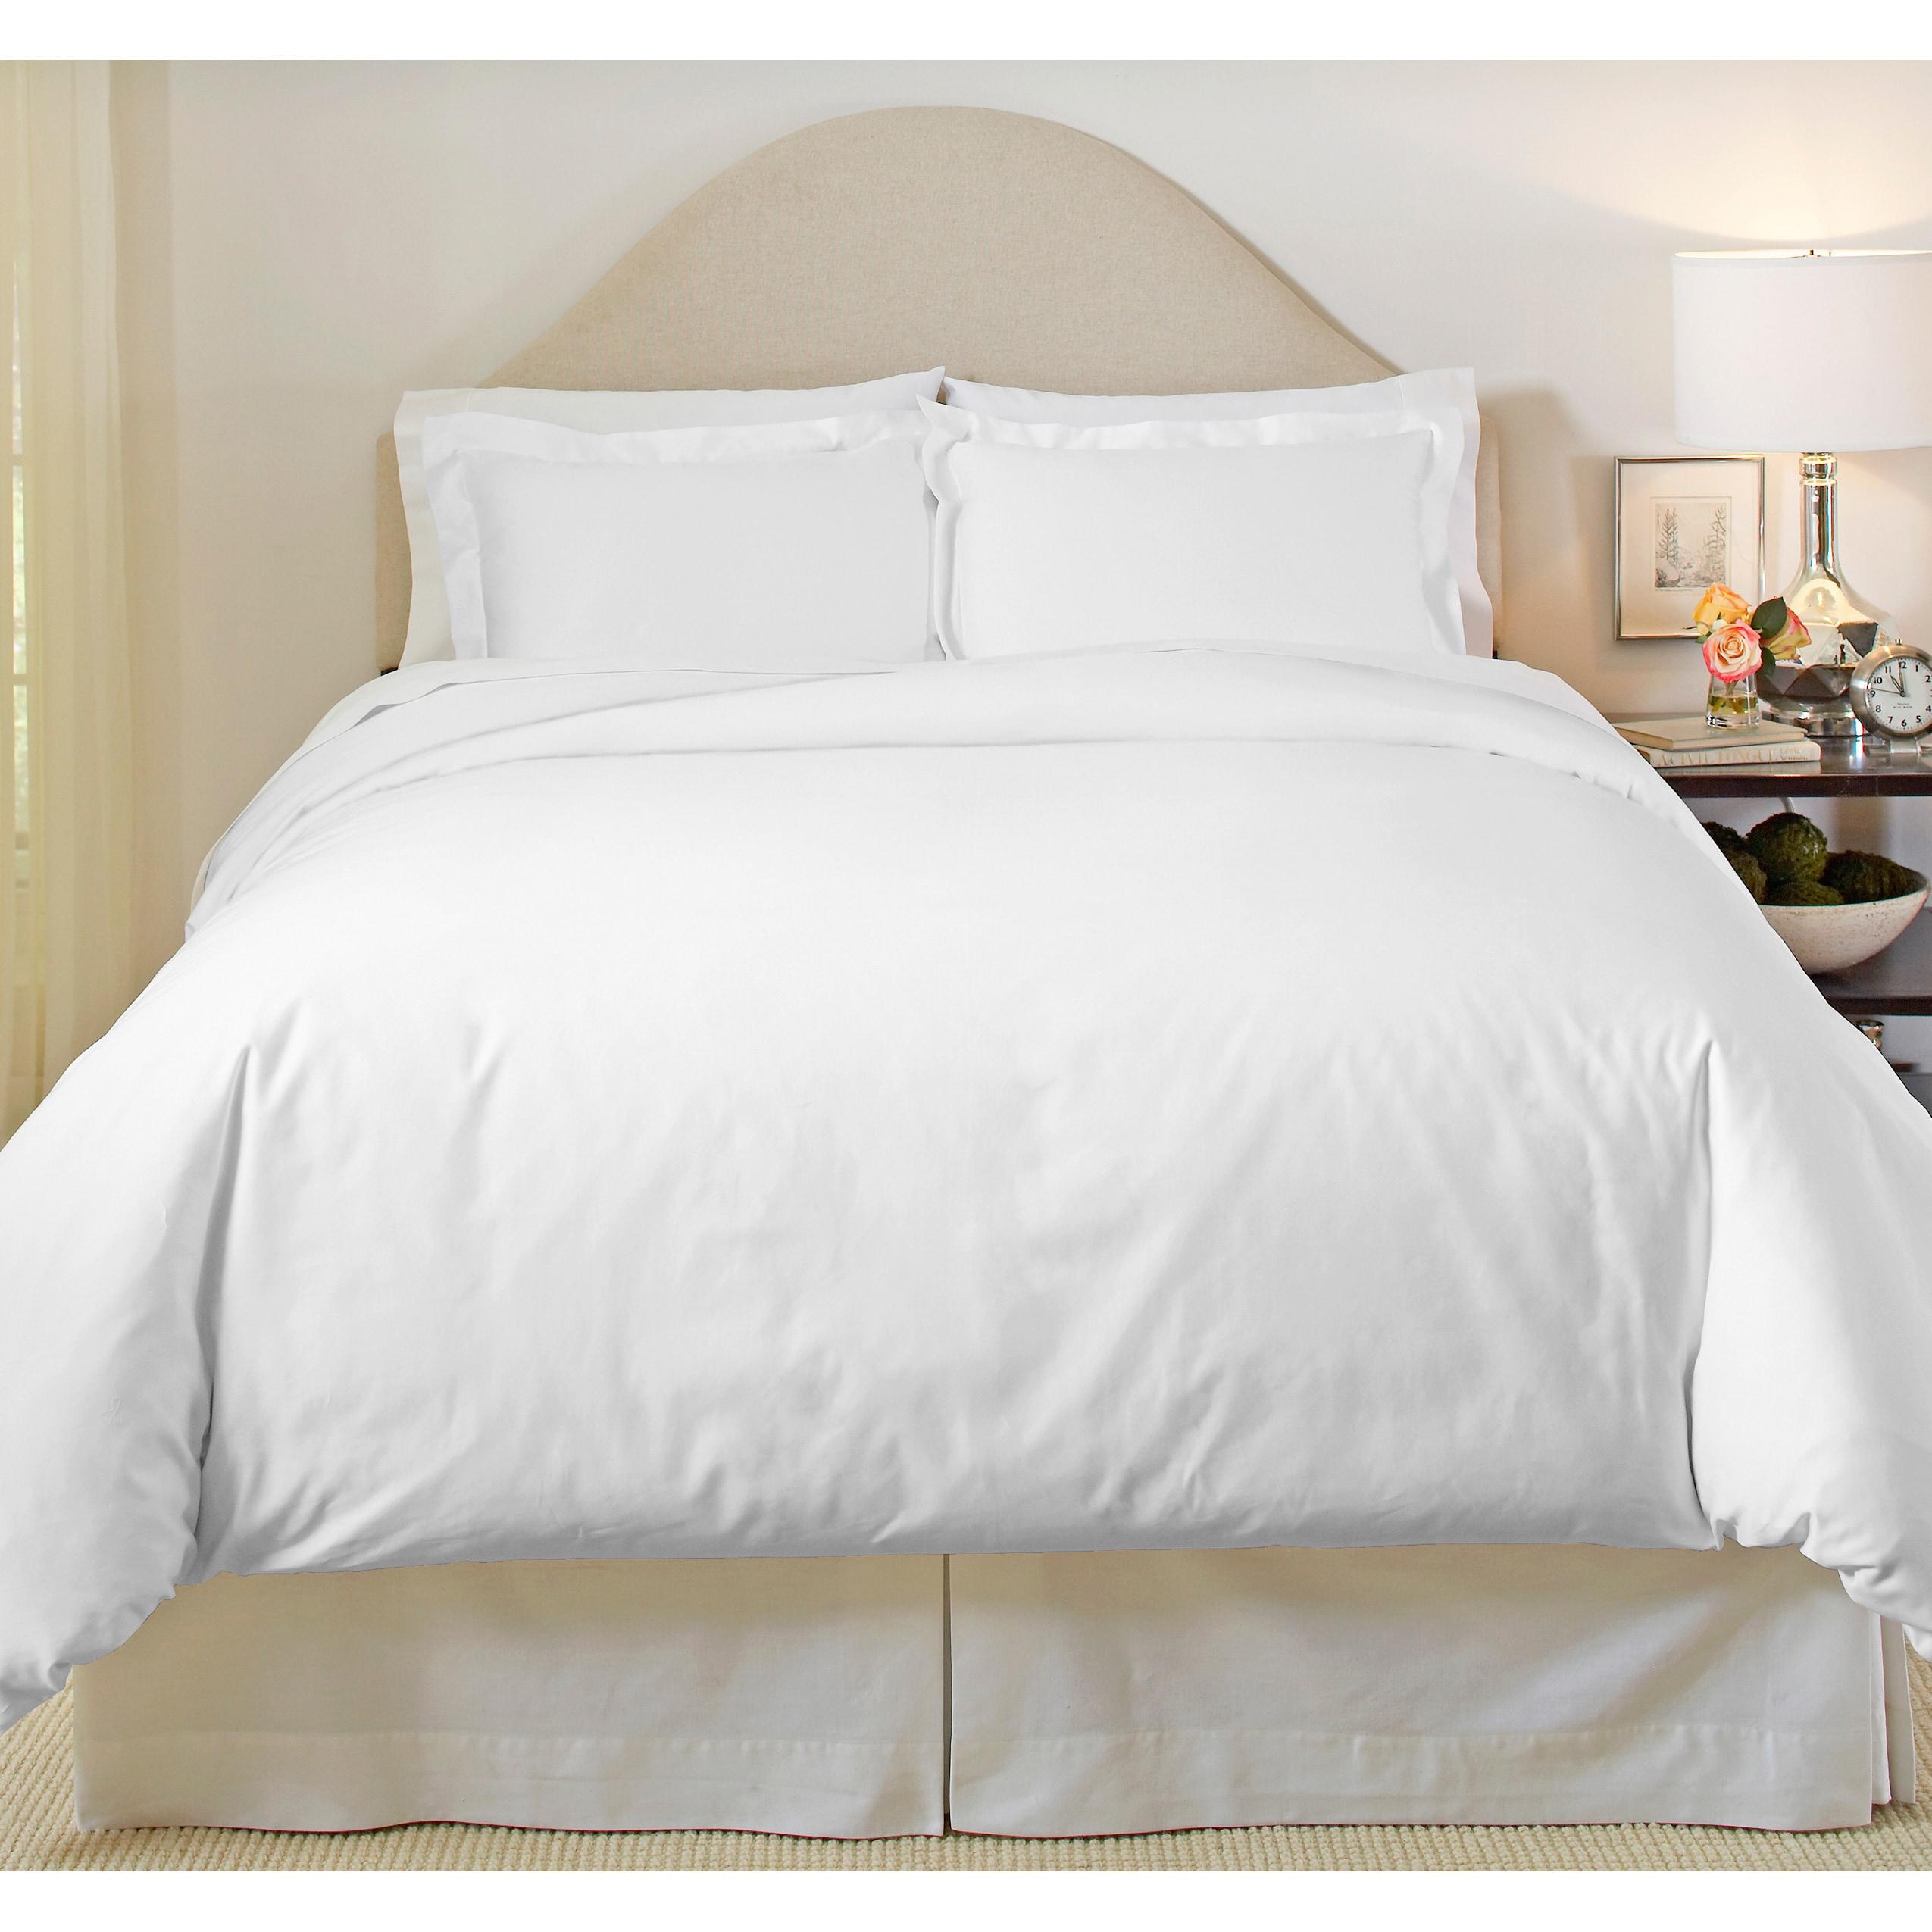 null greshemnavy gresham quilt stitch and coverlet pick collections comforter shop linen en ca duvet images delmore cover bedding linenpickstich